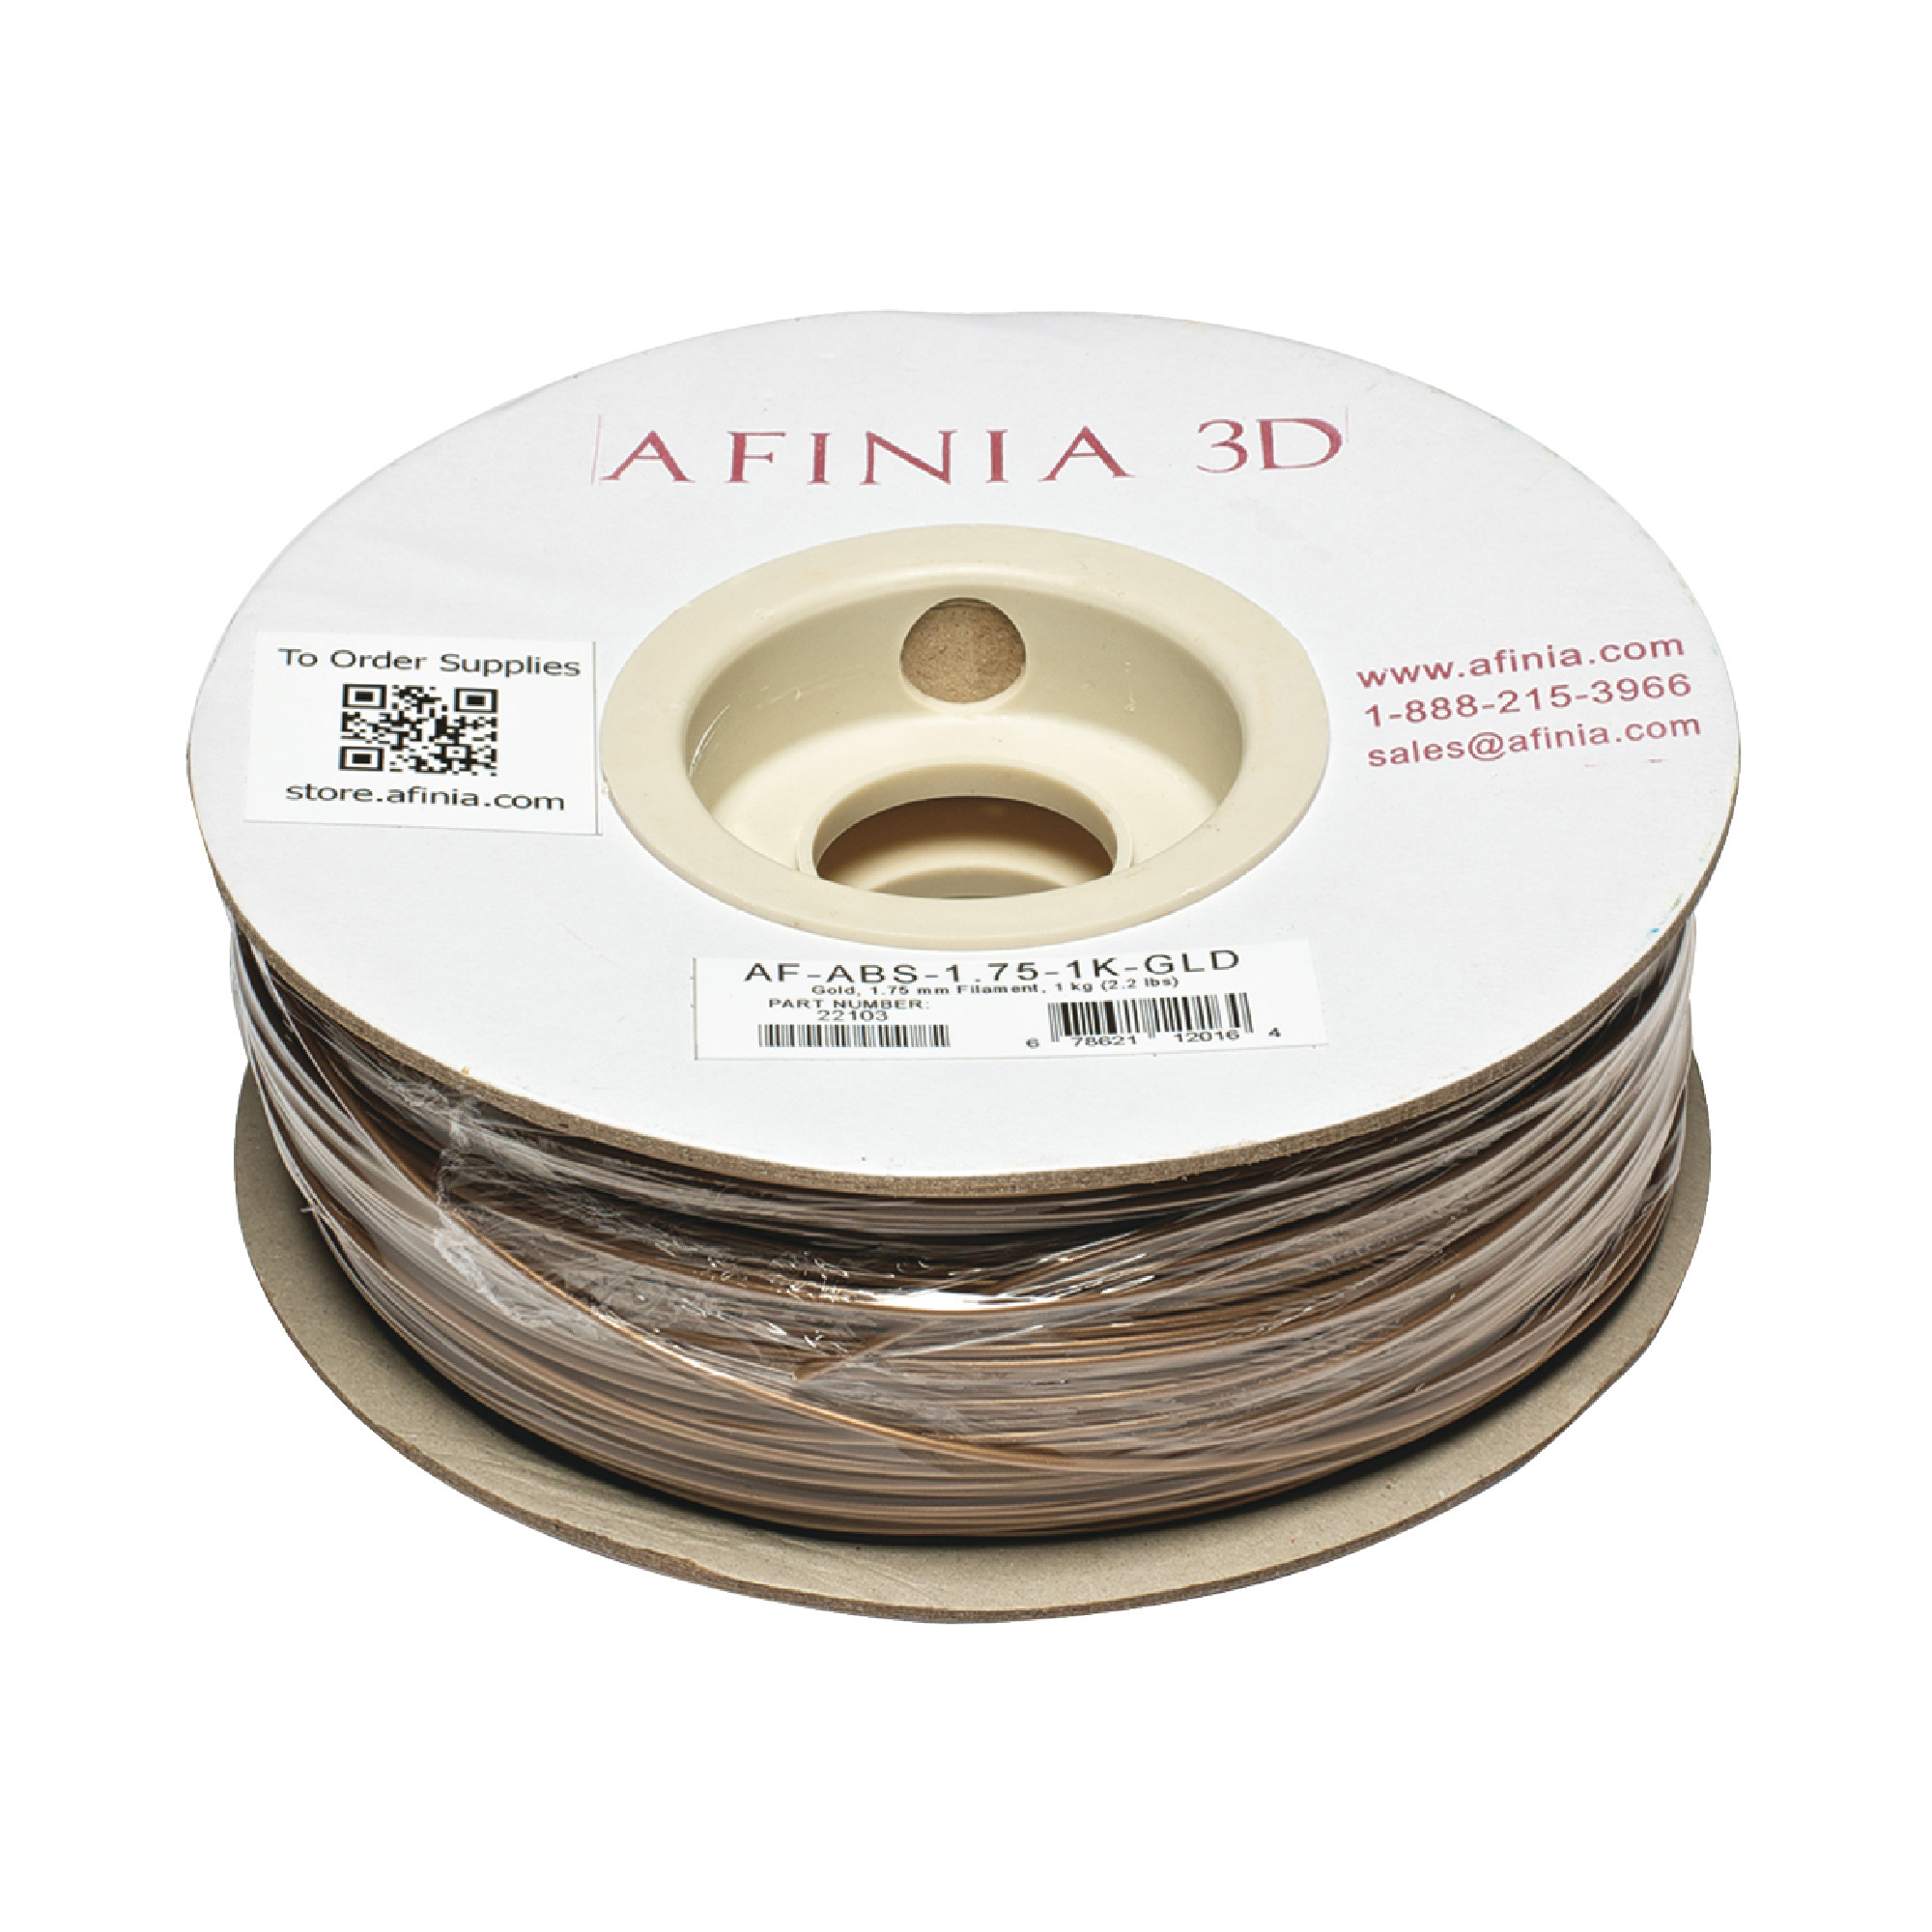 1.75 Valueline ABS Filament